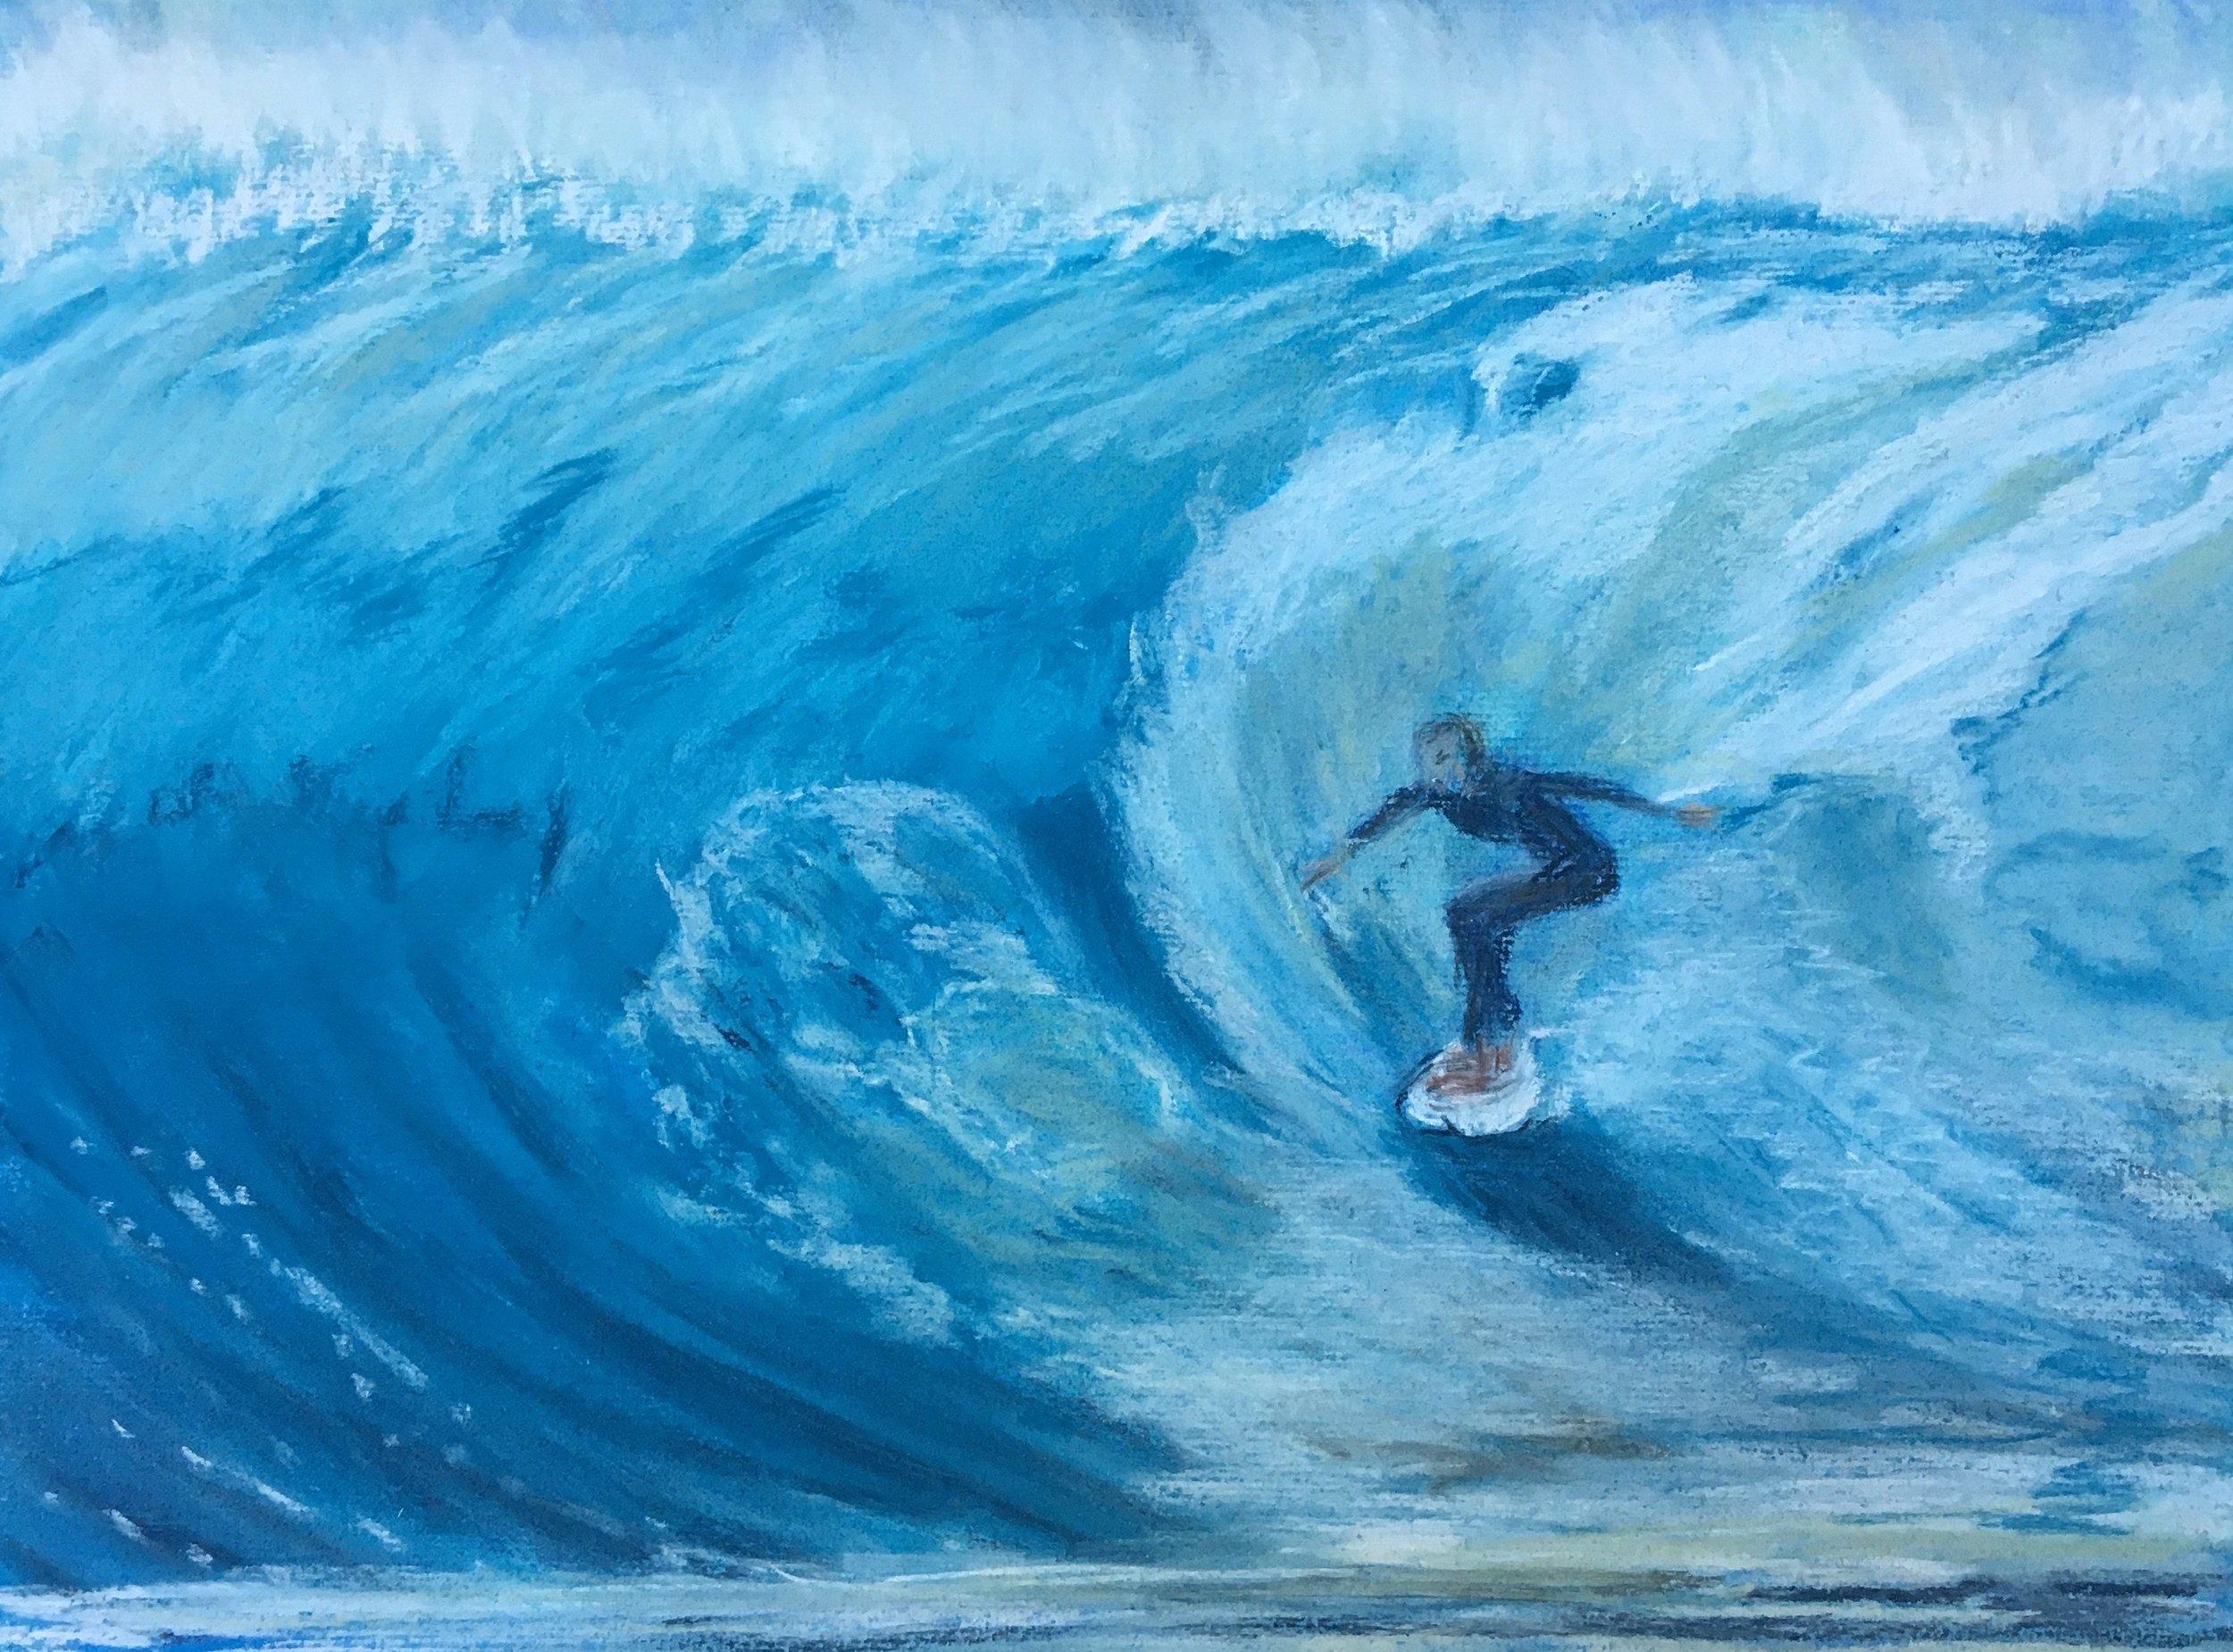 Print 17 - Surfing - Size: 274 x 203